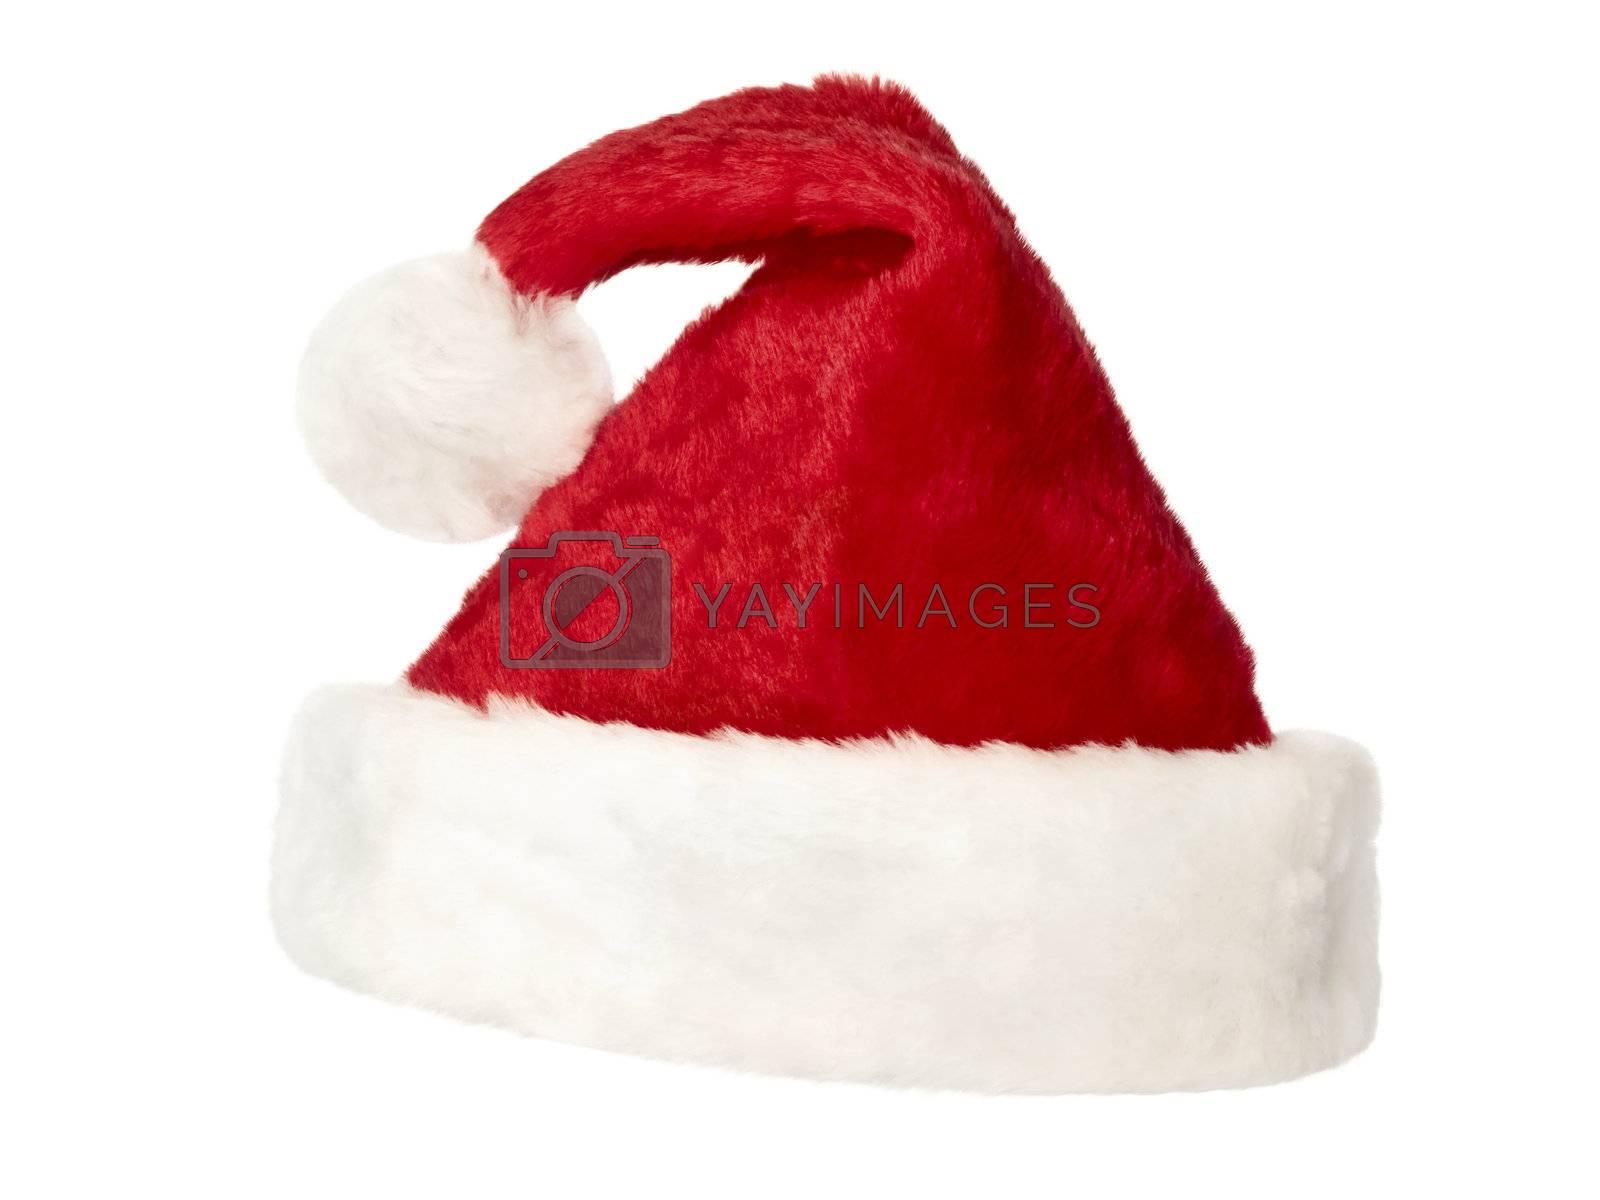 Royalty free image of Santa`s hat by SNR